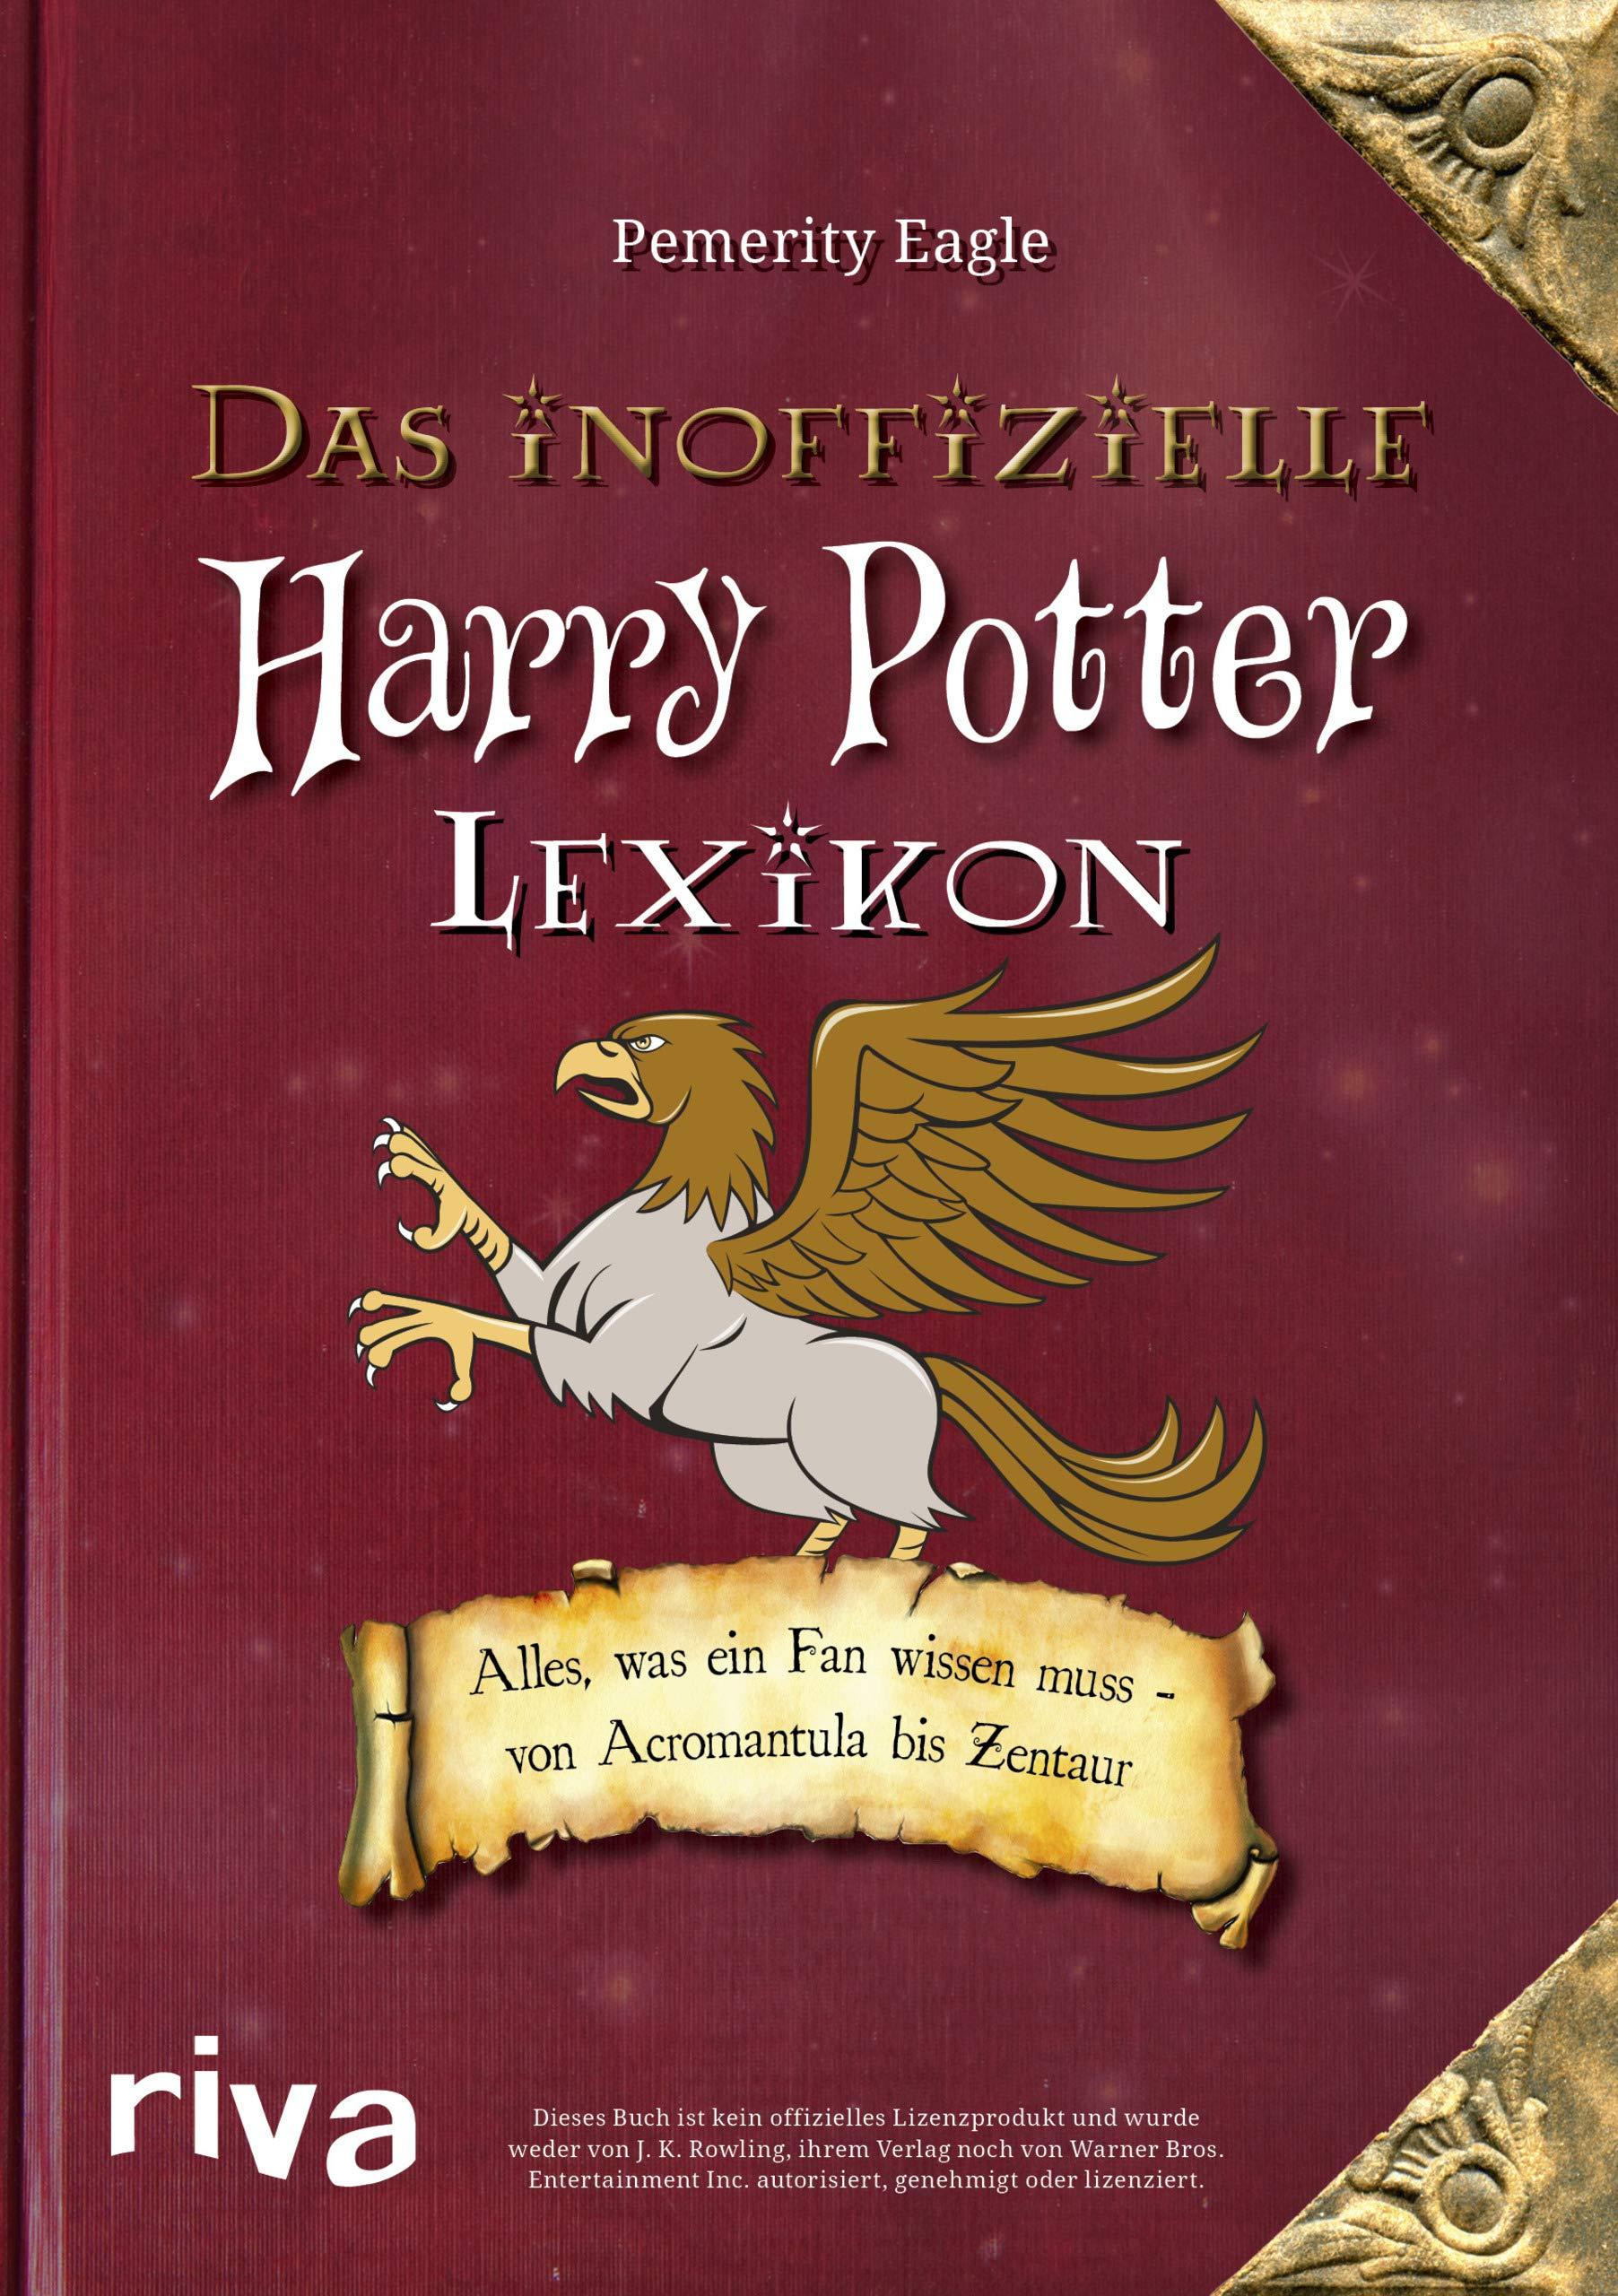 Das Inoffizielle Harry Potter Lexikon Alles Was Ein Fan Wissen Muss Von Acromantula Bis Zentaur Amazon De Eagle Pemerity Bucher